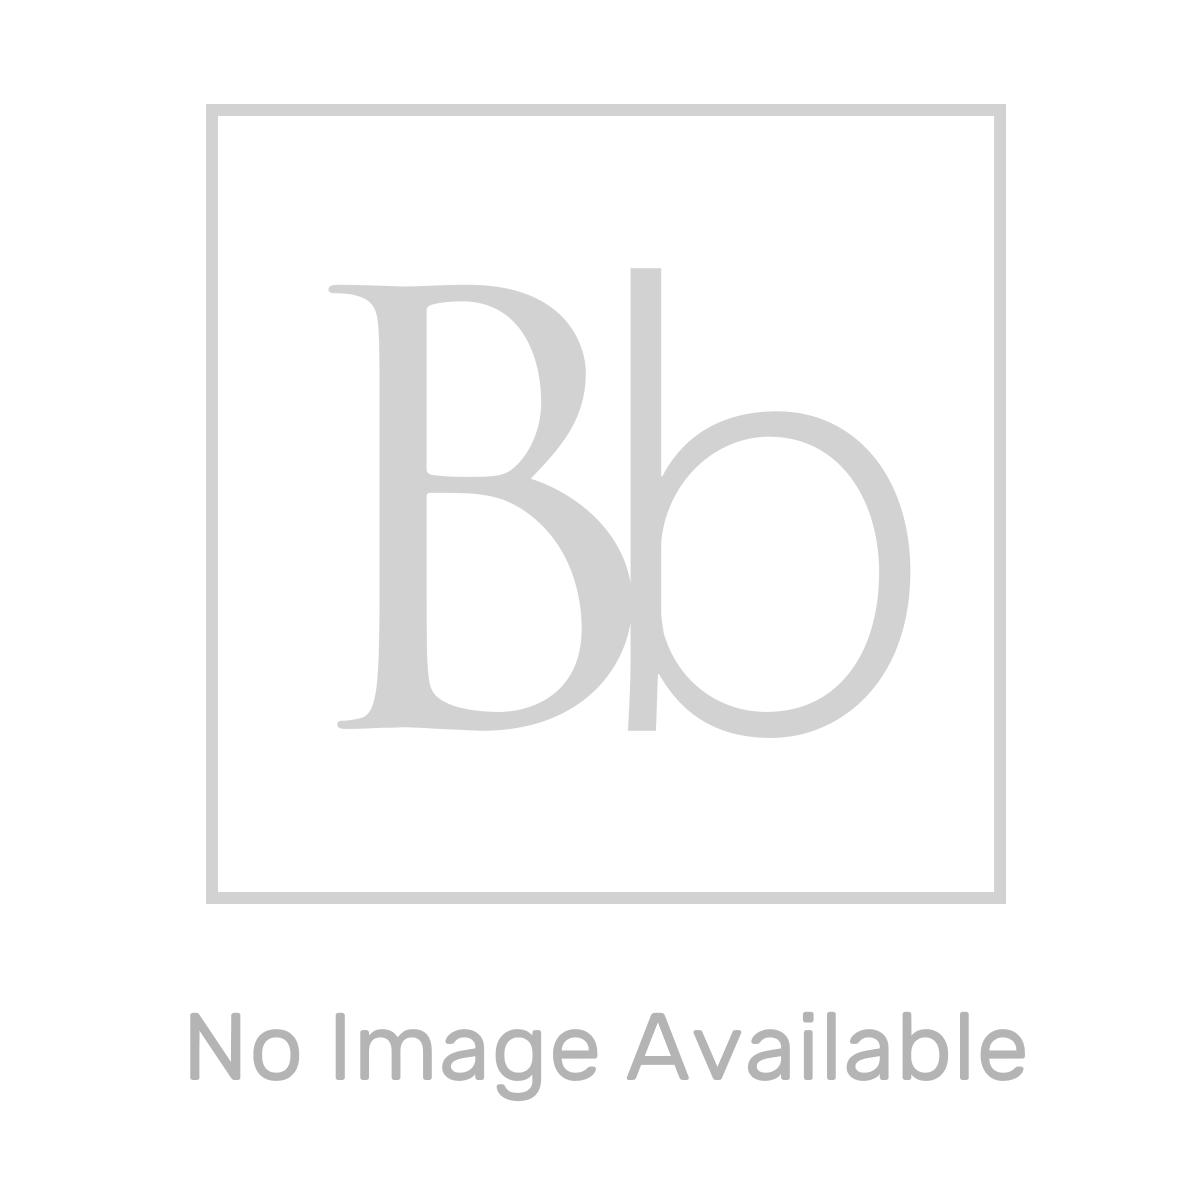 RAK Feeling White Rectangular Shower Tray 1400 x 900mm Measurements